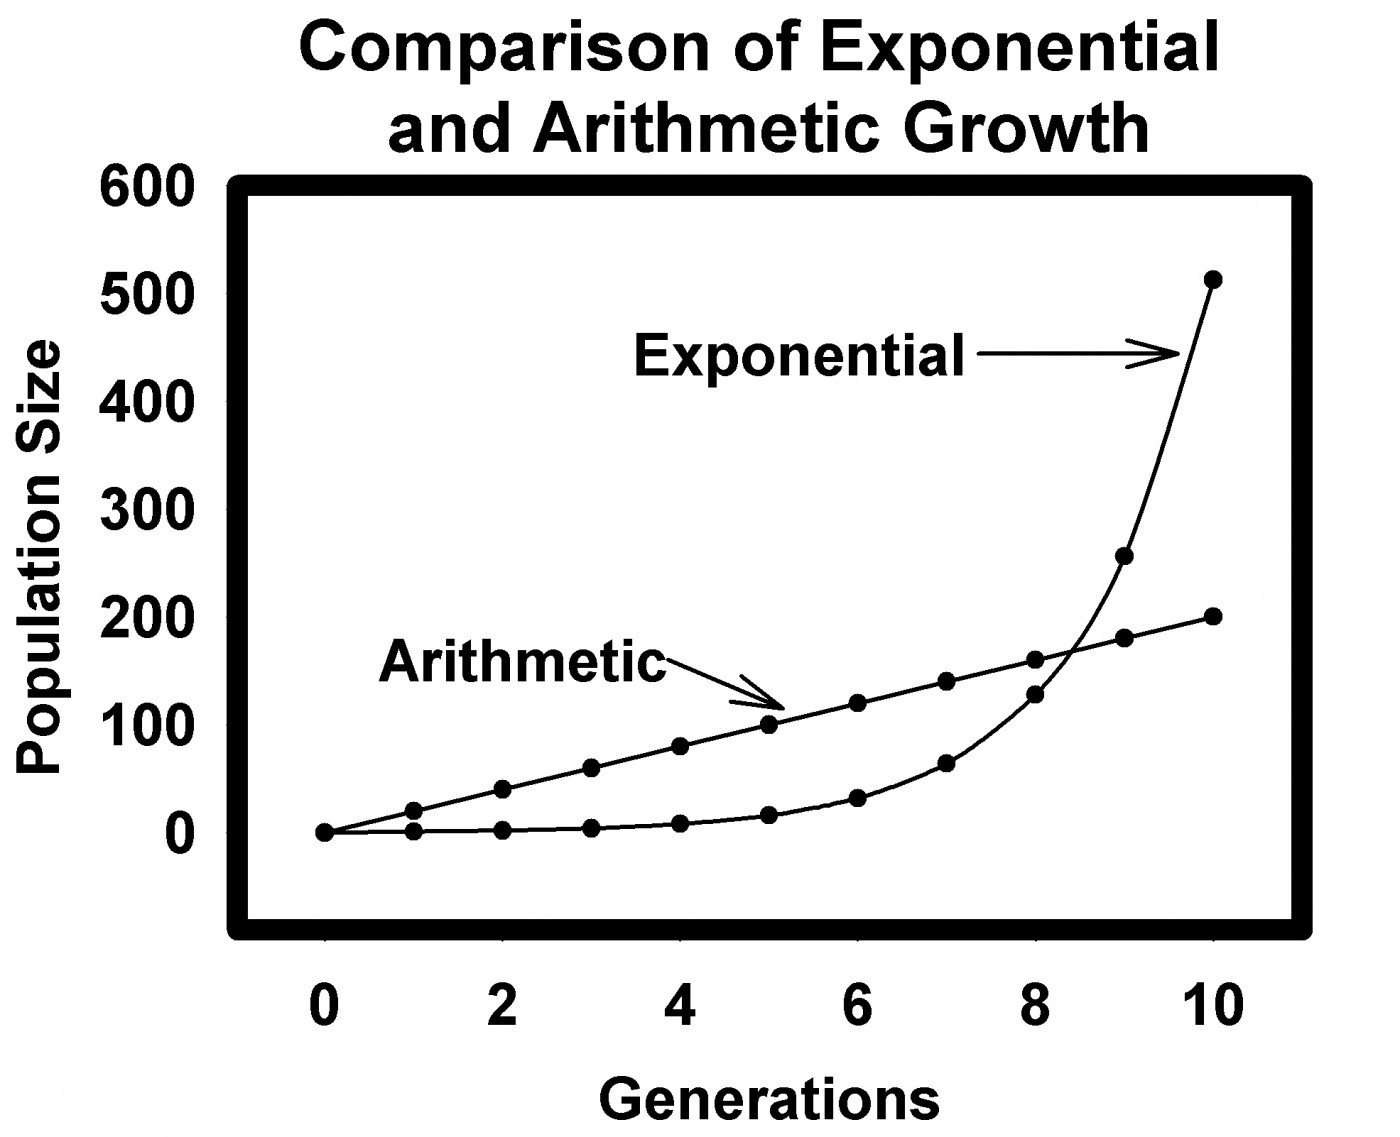 005 Malthusgrowthcurves Jpg Essay Example On The Principle Of Singular Population Malthus Sparknotes Thomas Main Idea 1400